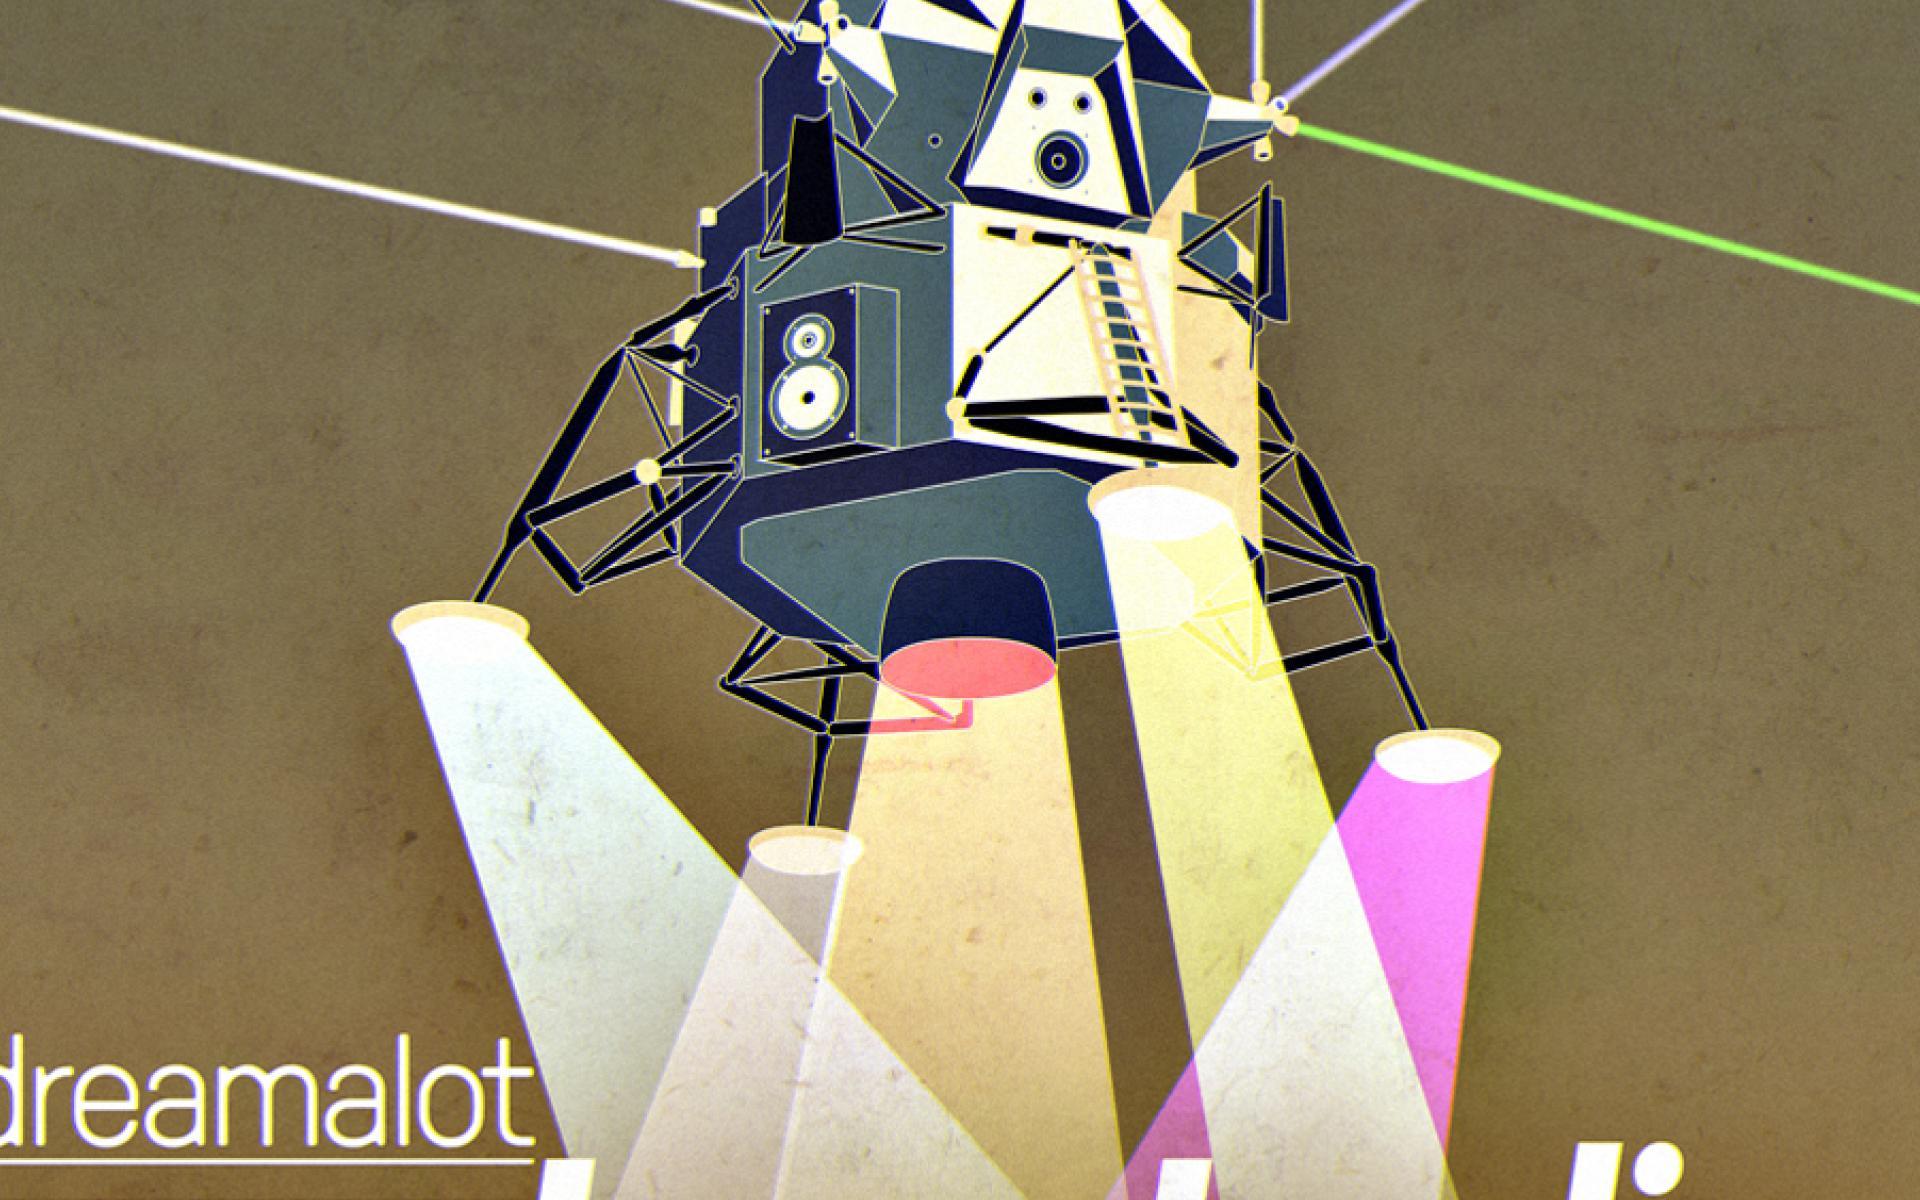 Dreamalot - Lunar Landing